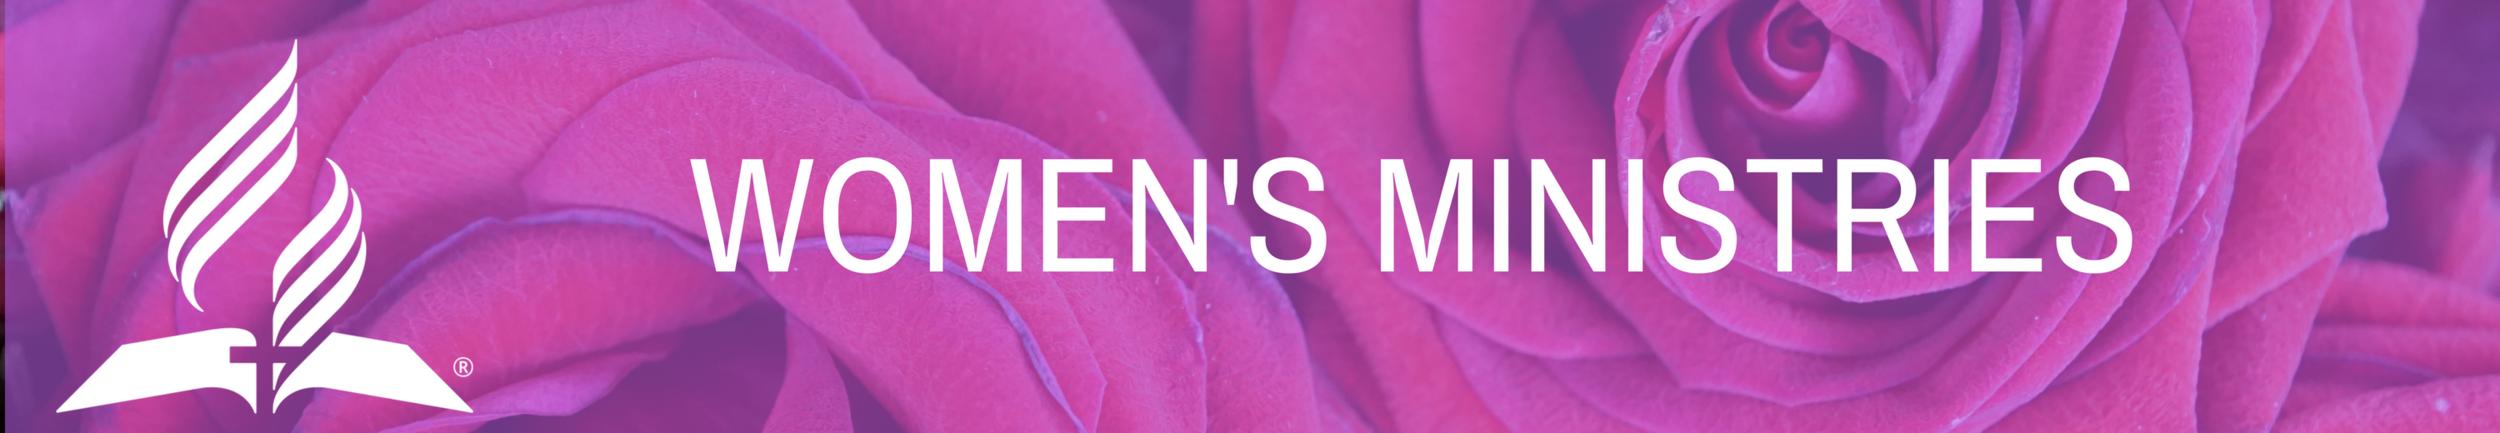 AECWomensministries